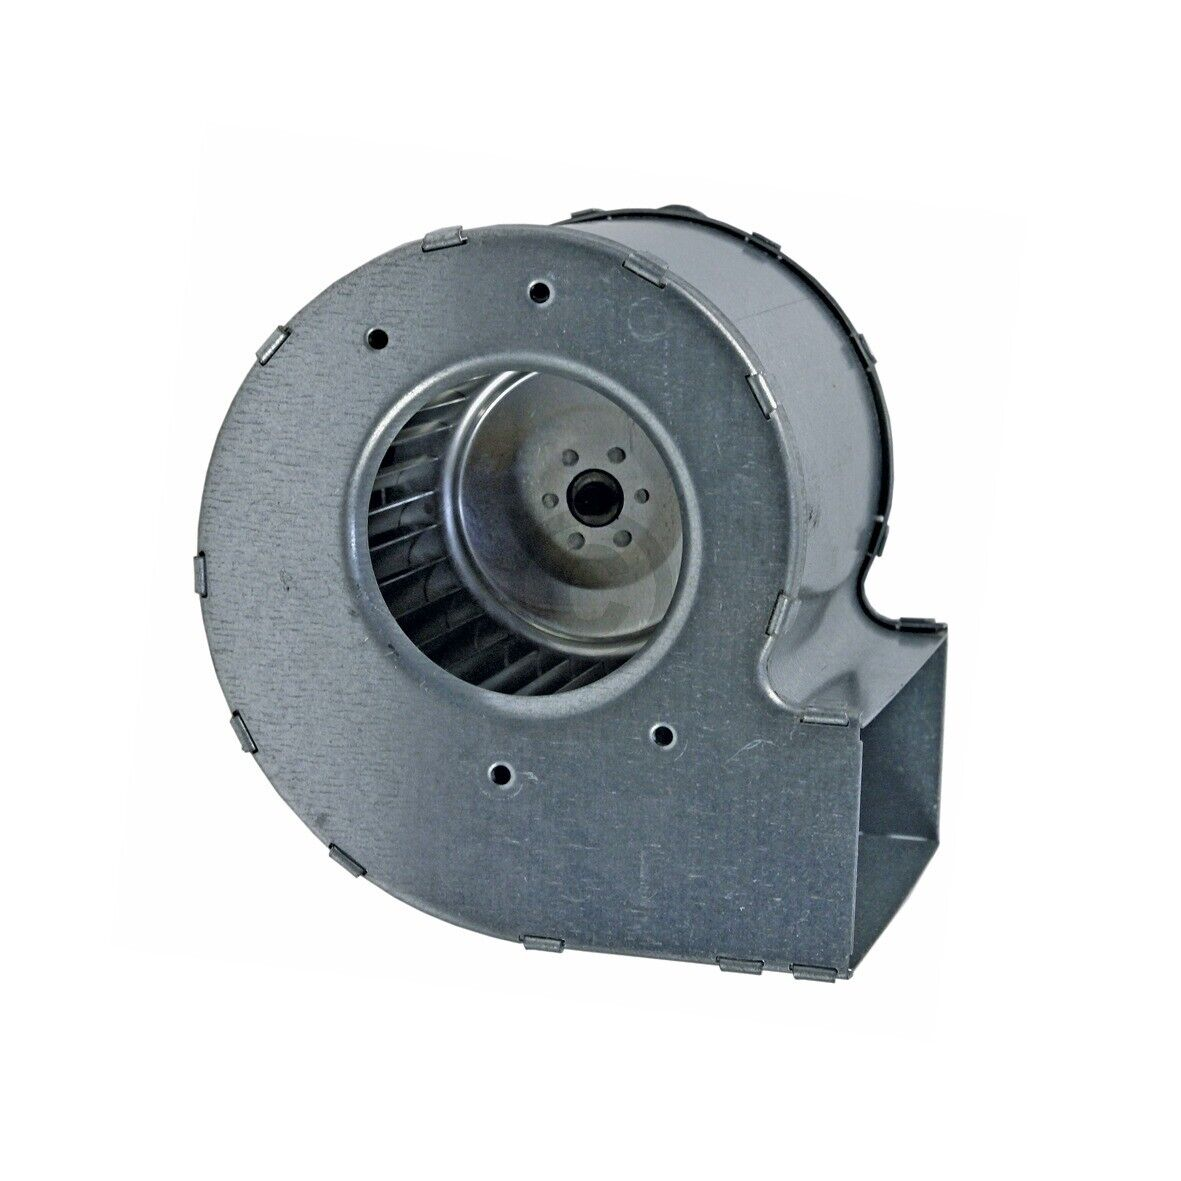 Querstrom Ventilateur STIEBEL ELTRON 245319 105 mm